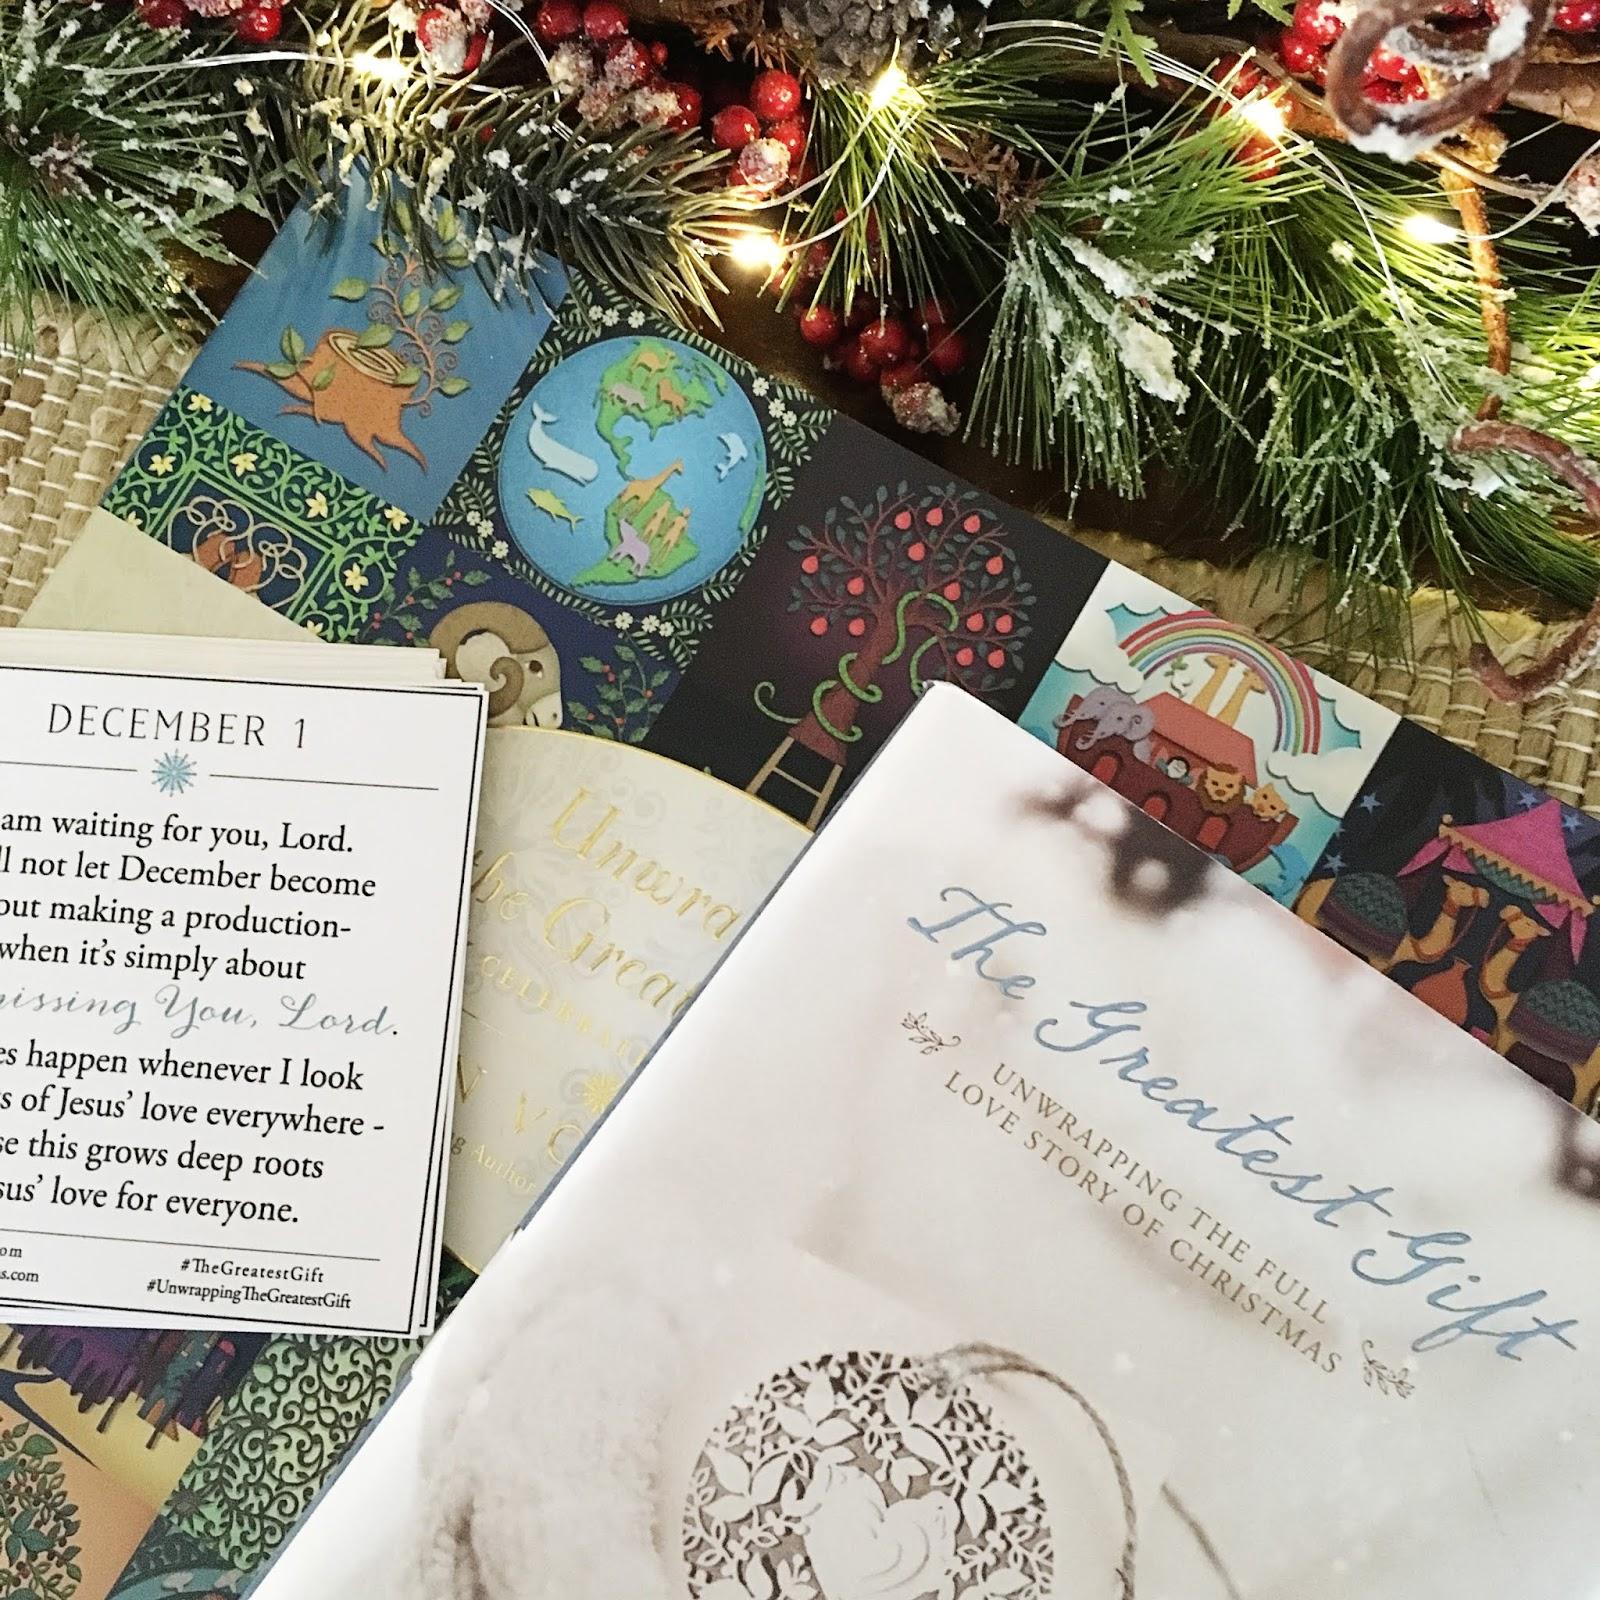 Pursuing Heart: On My Heart: December Rhythms